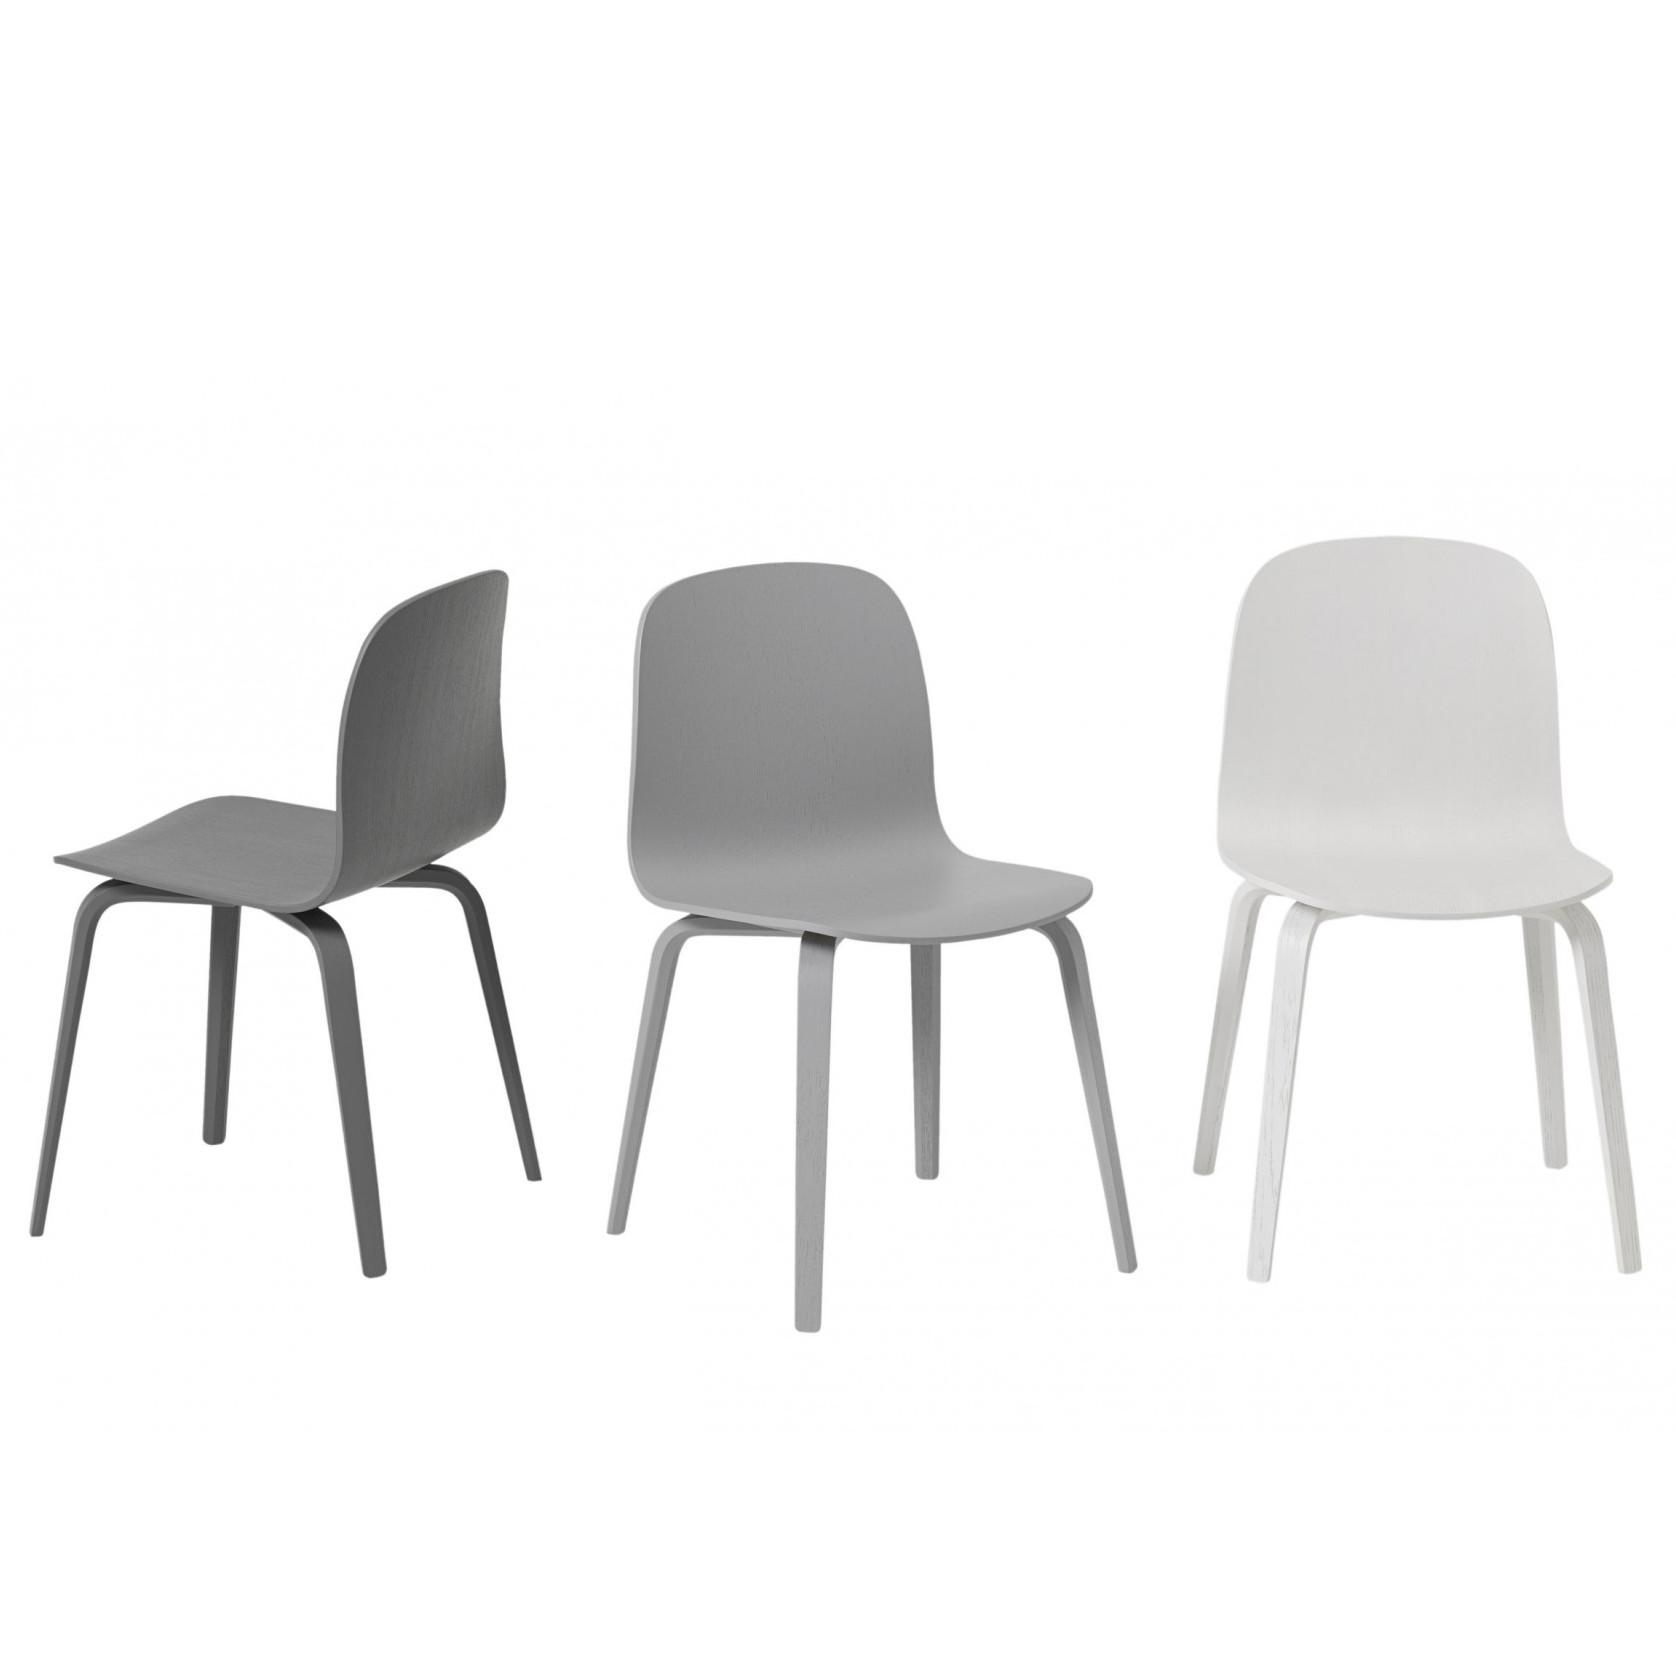 Muuto, Visu chair, Wood base, Black